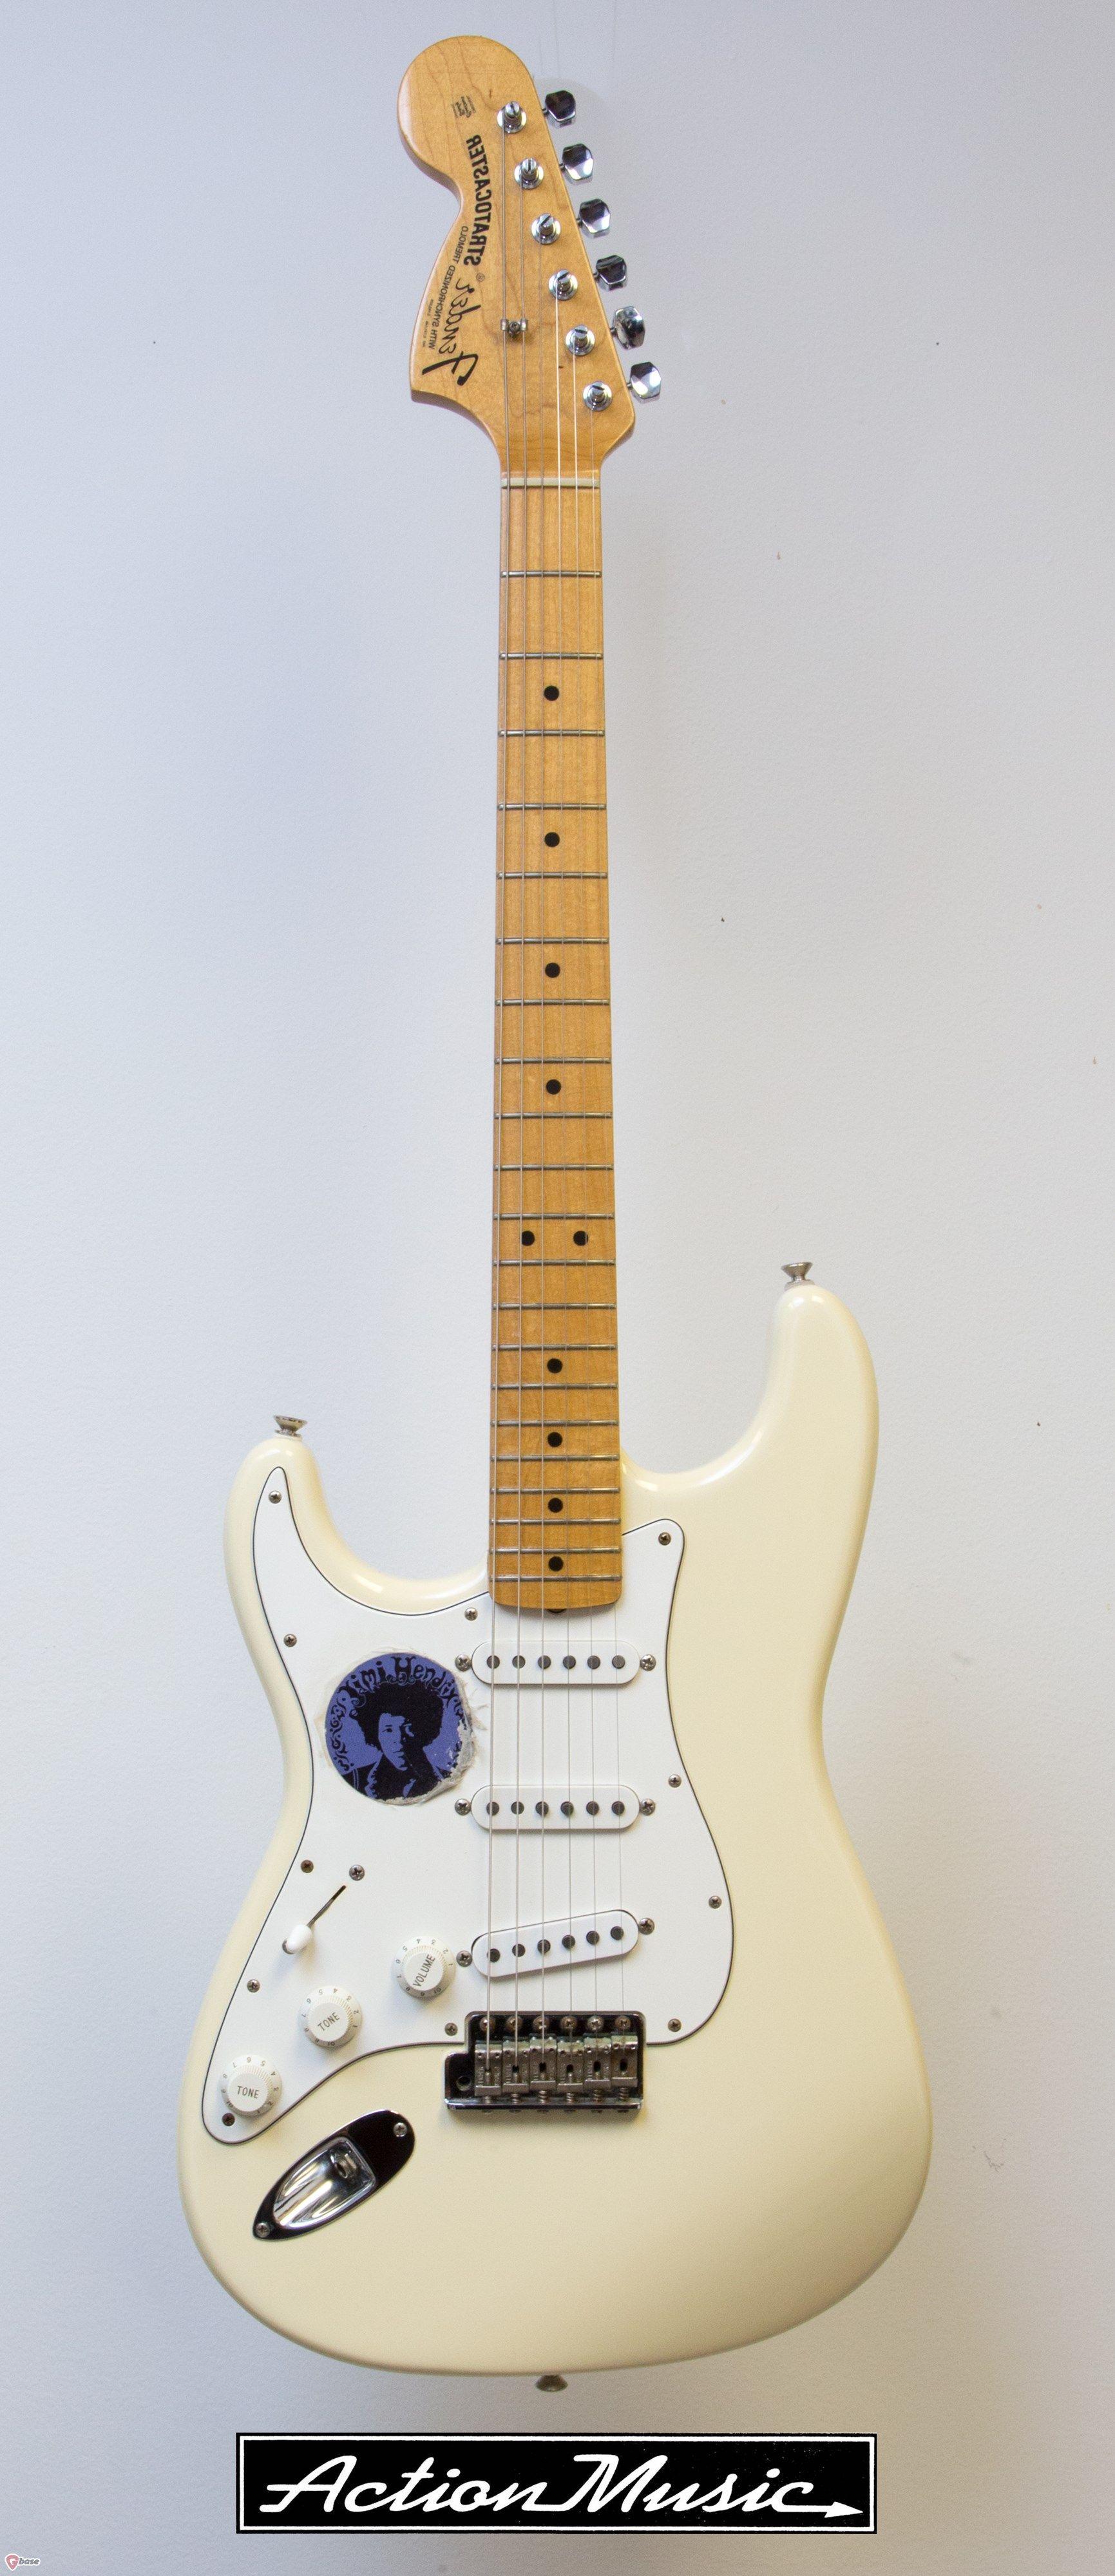 1997 Fender Jimi Hendrix Stratocaster Guitars Electric Solid Body Gbase Com Jimi Hendrix Stratocaster Jimi Hendrix Hendrix